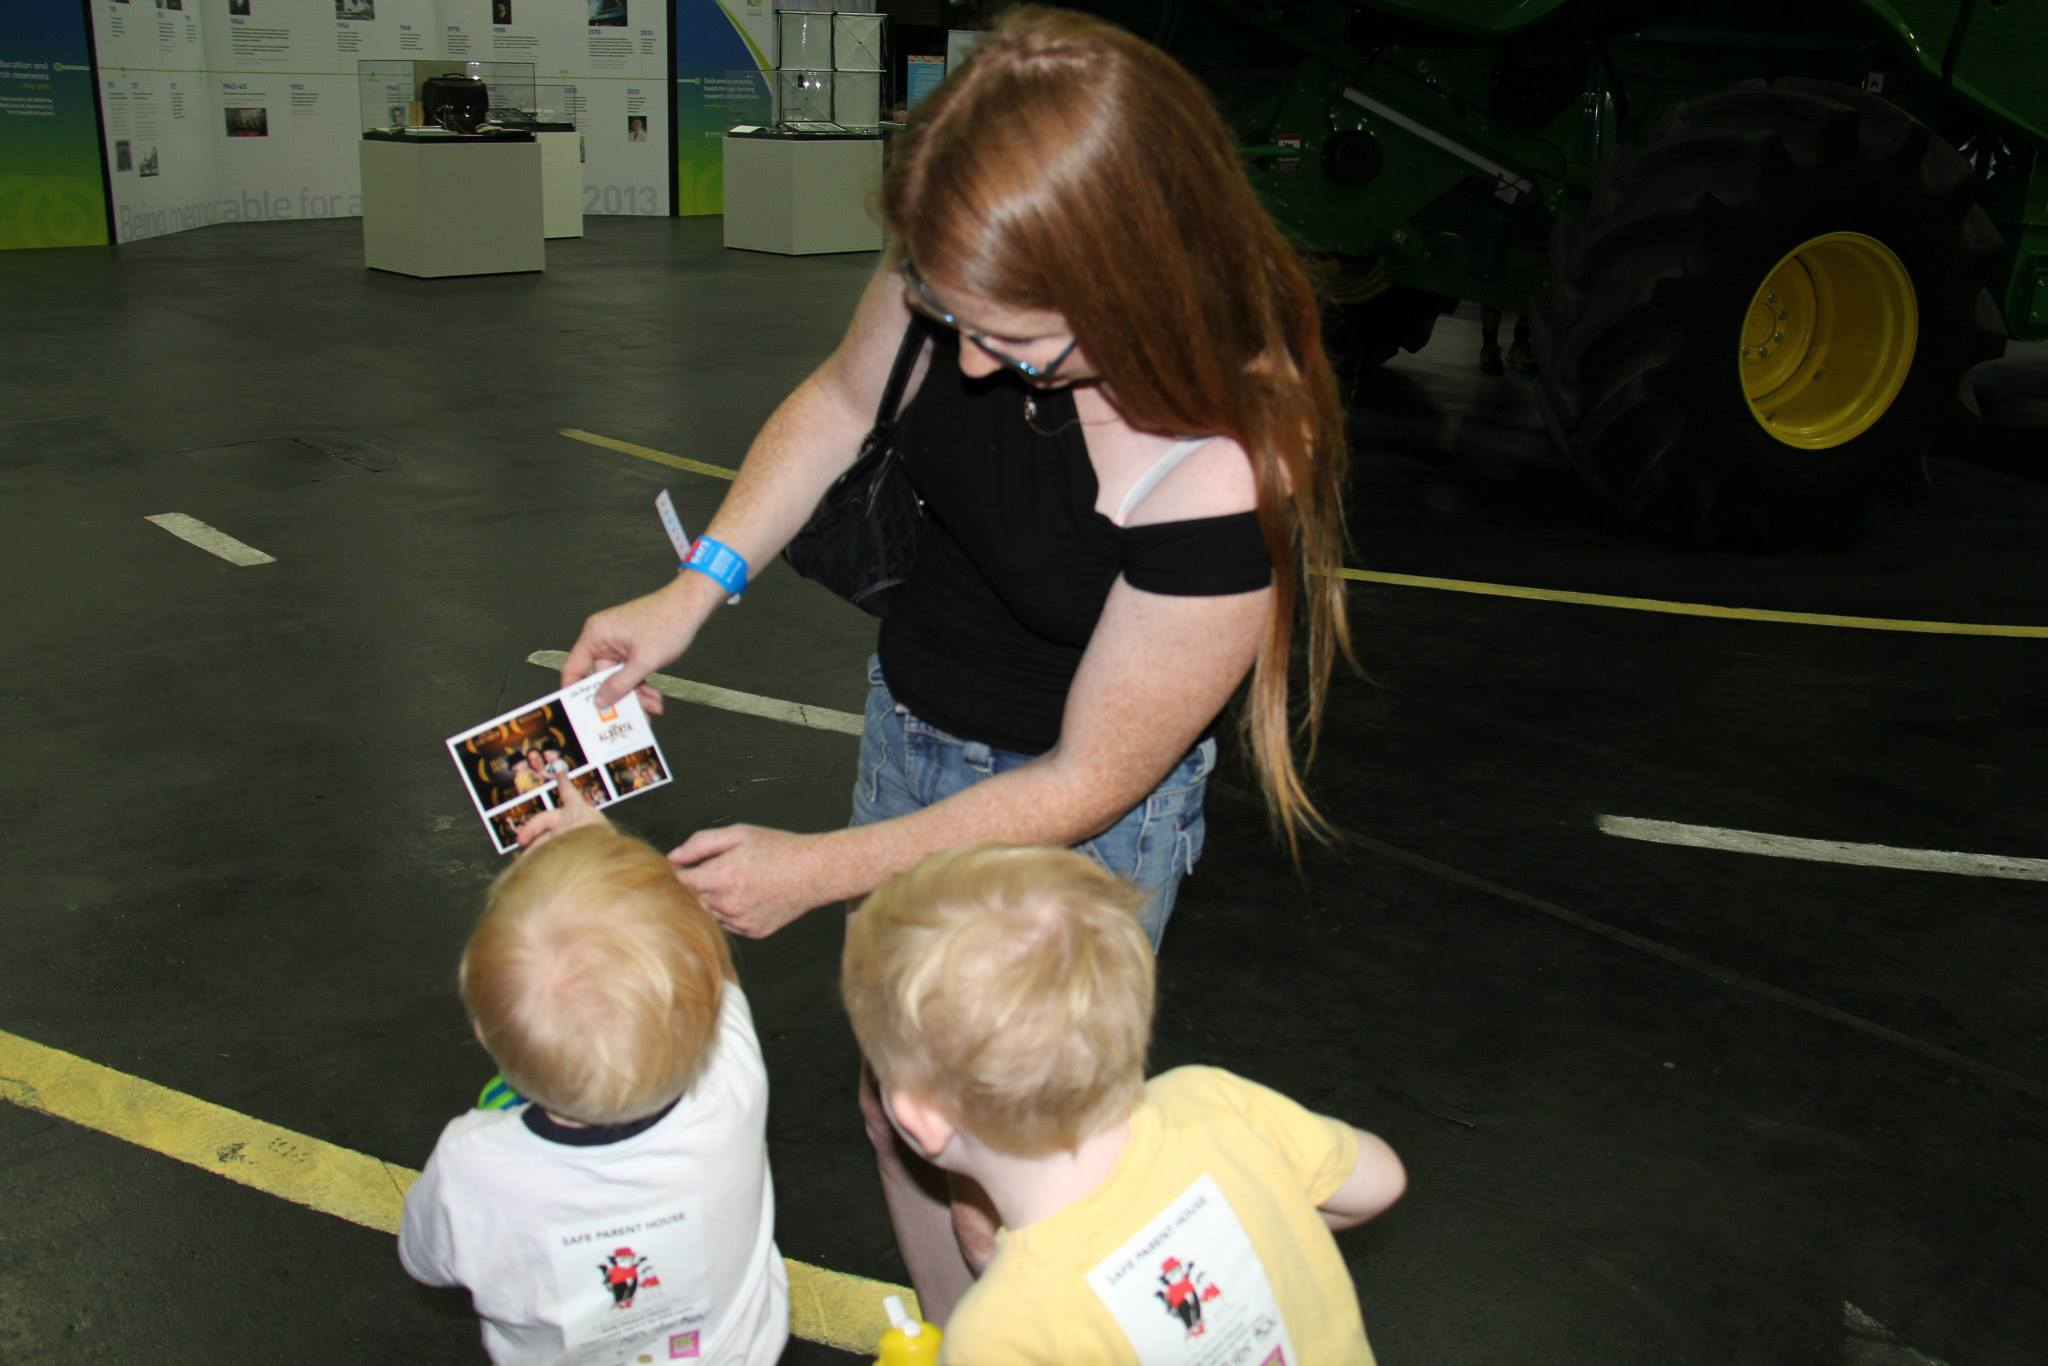 Kdays - Our Alberta Exhibit